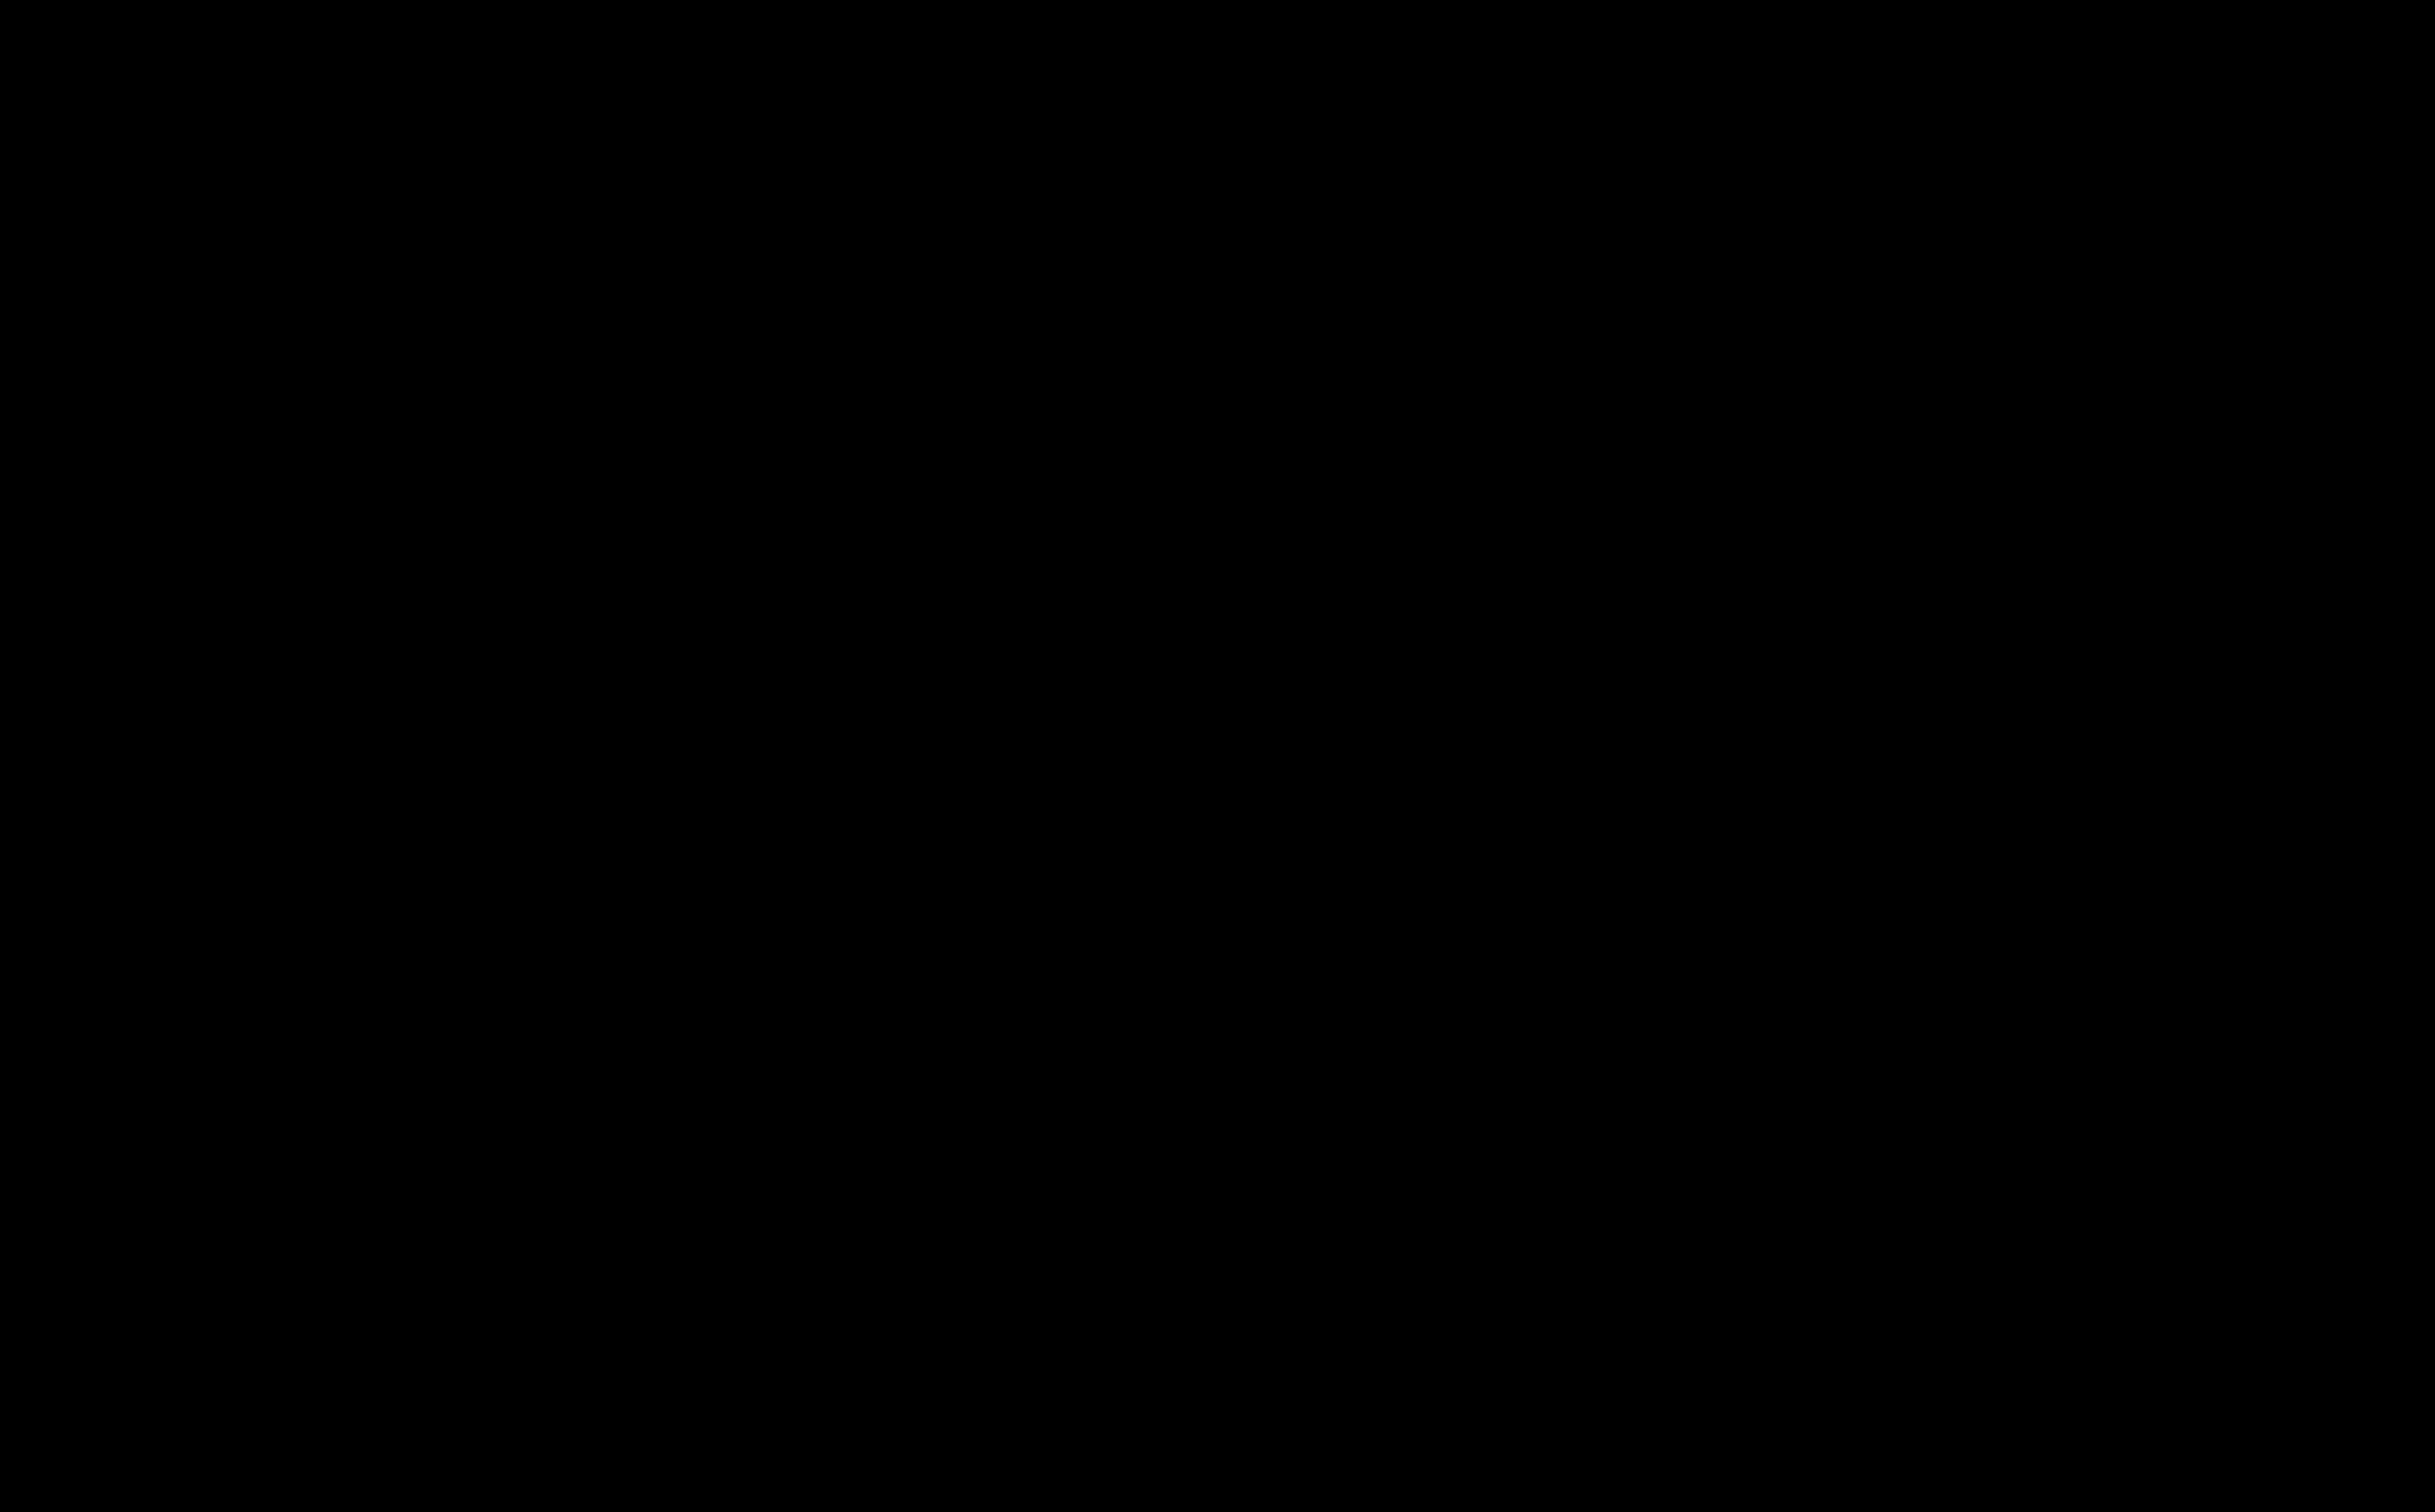 Better U Ketamine Logo